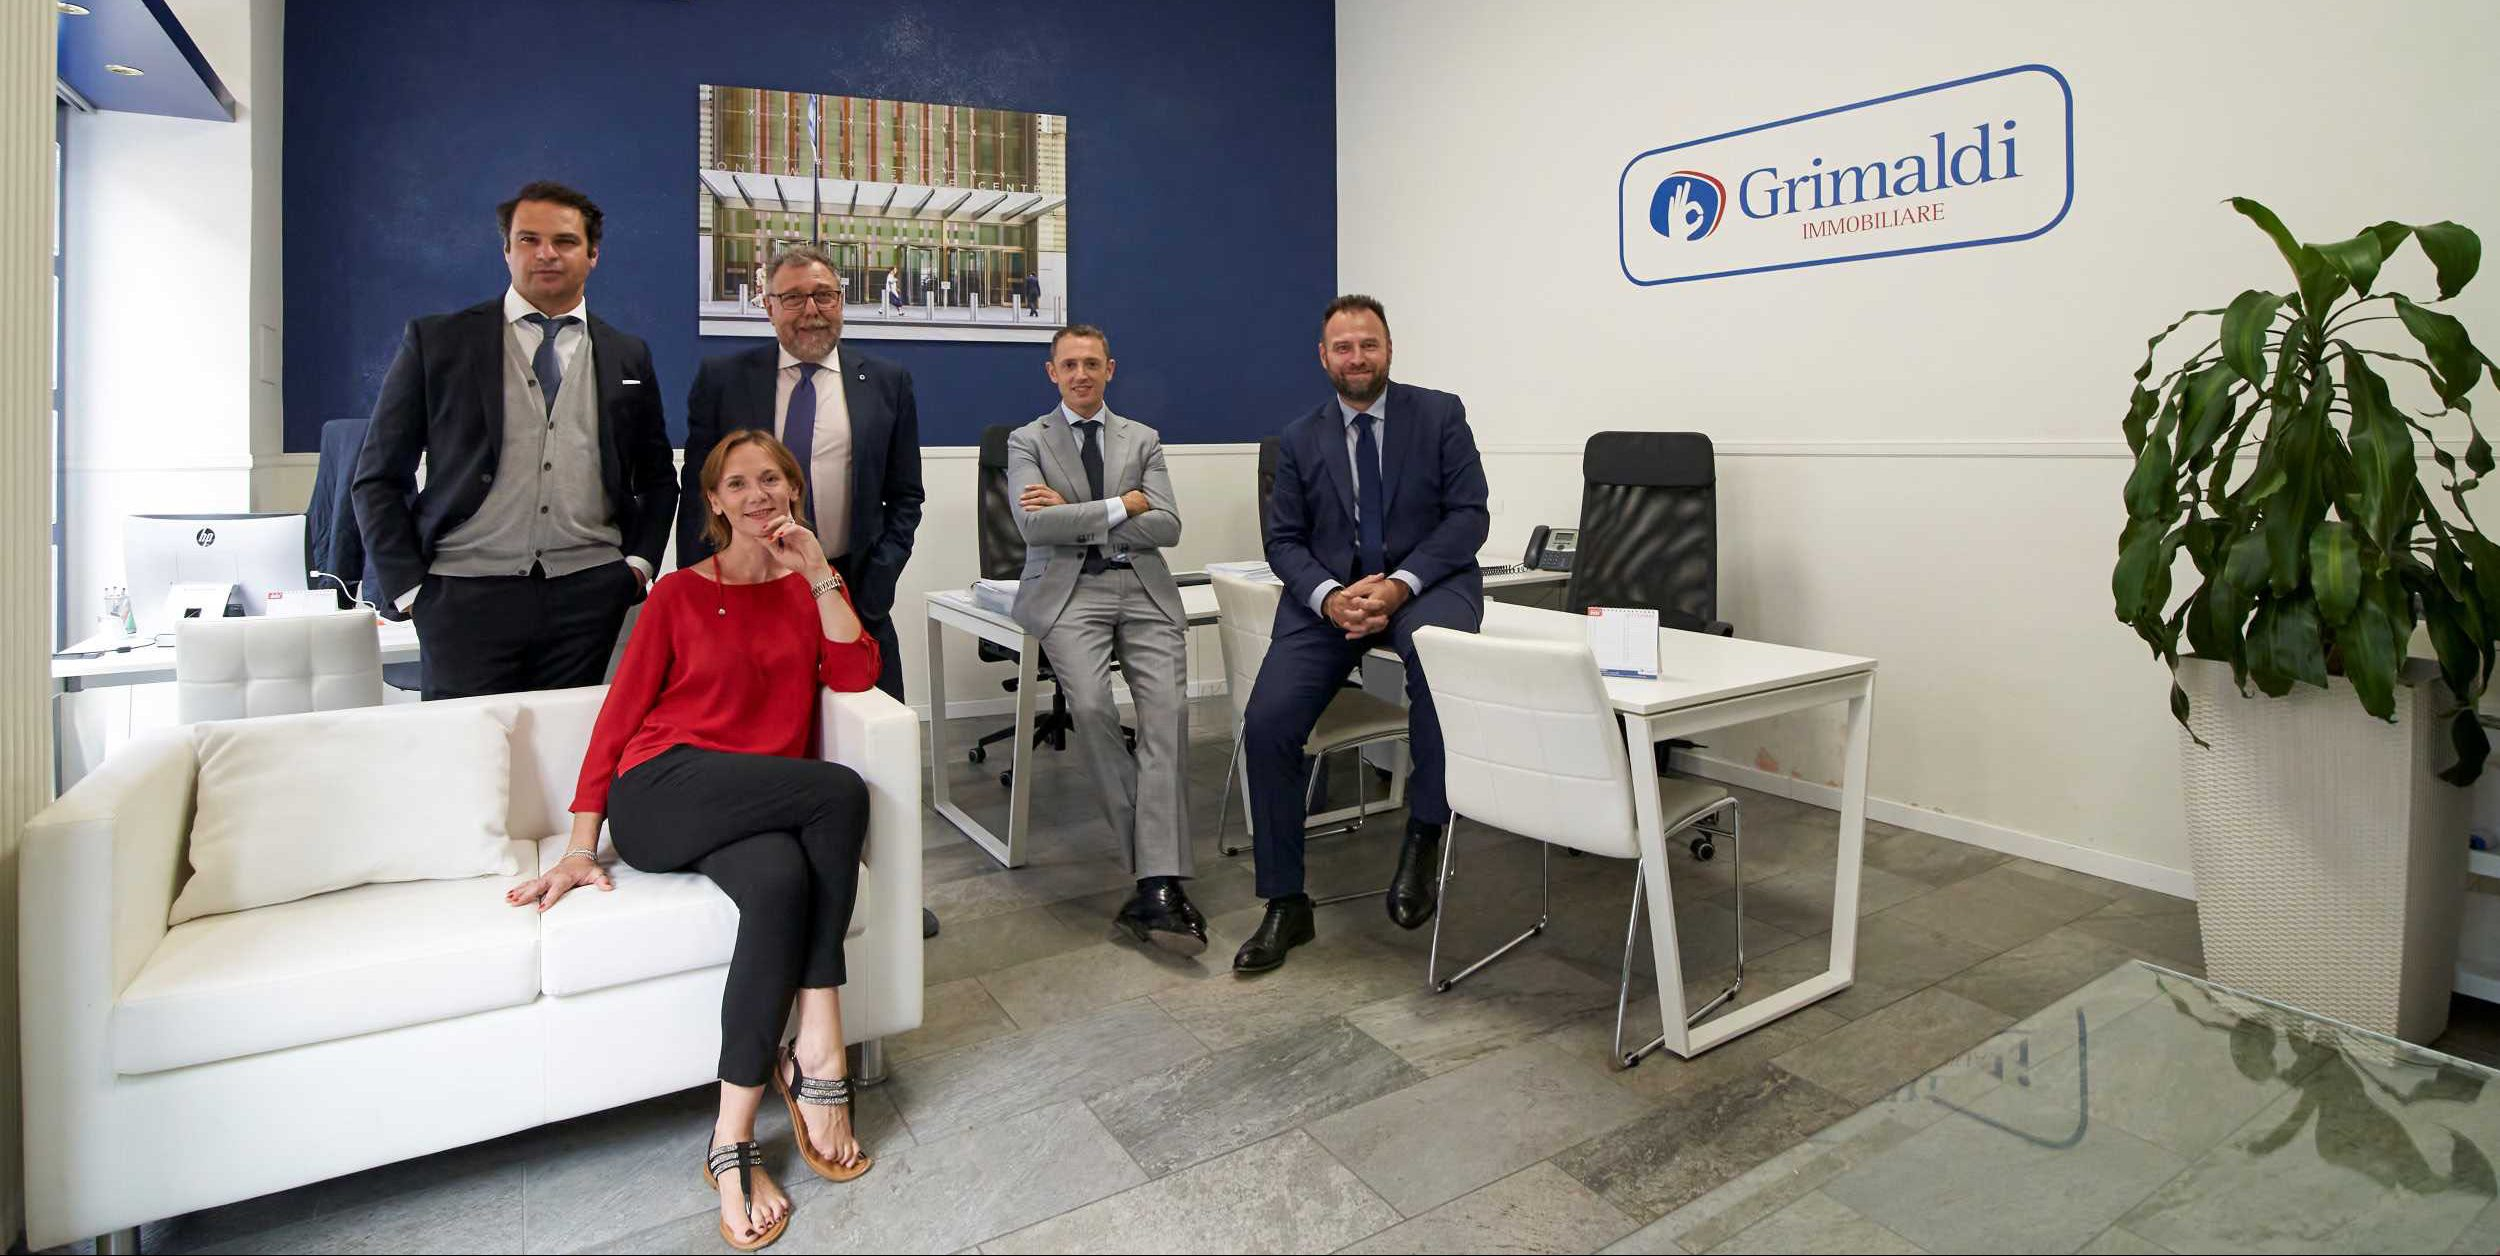 Grimaldi team